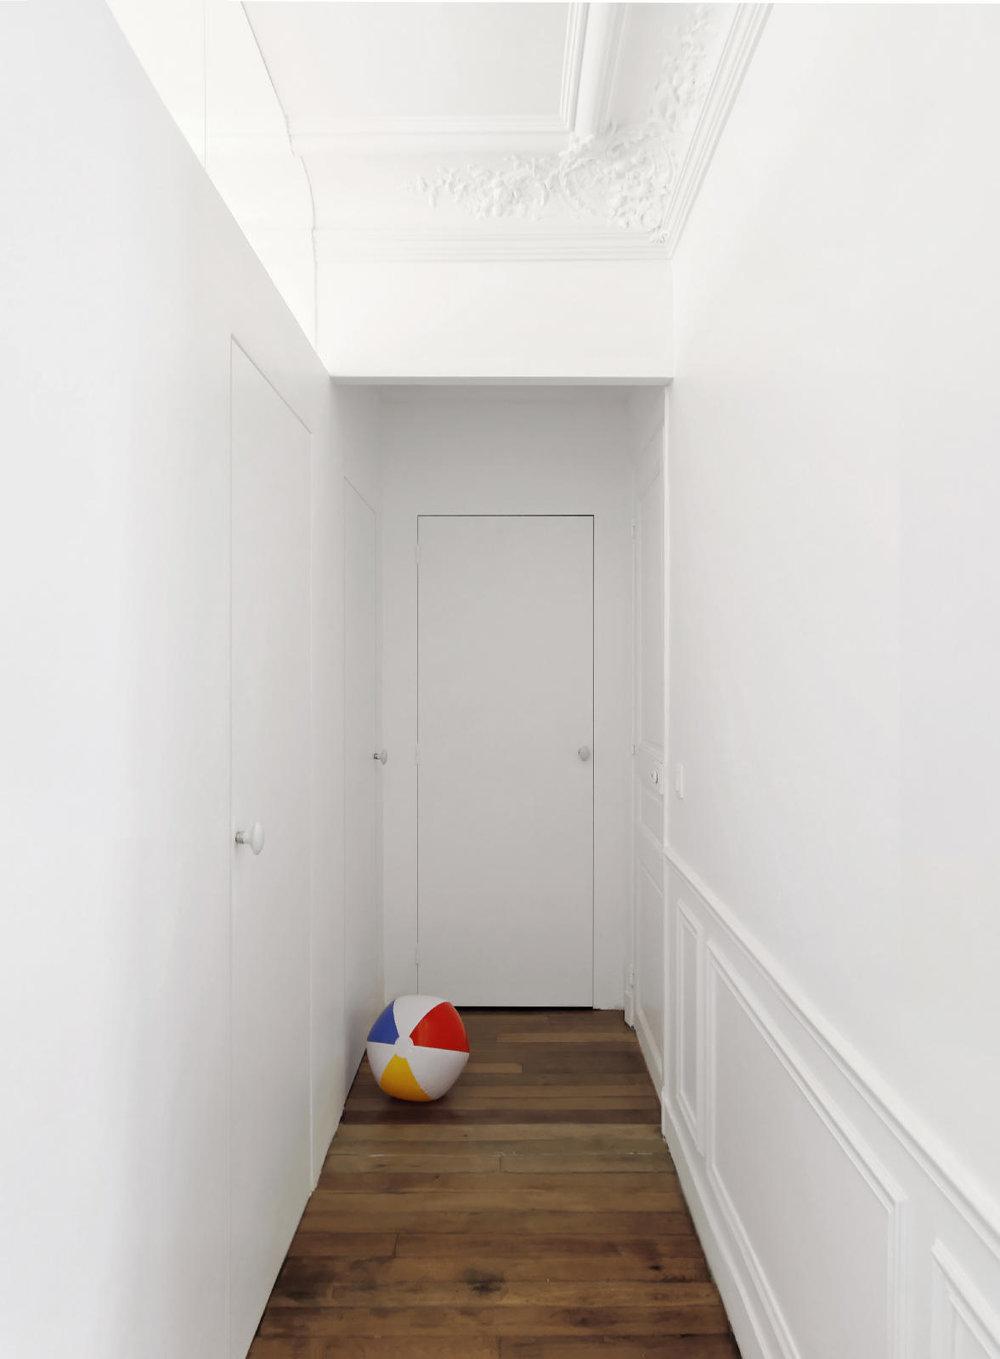 archaic_nicolasdorval_apartment_20.jpg